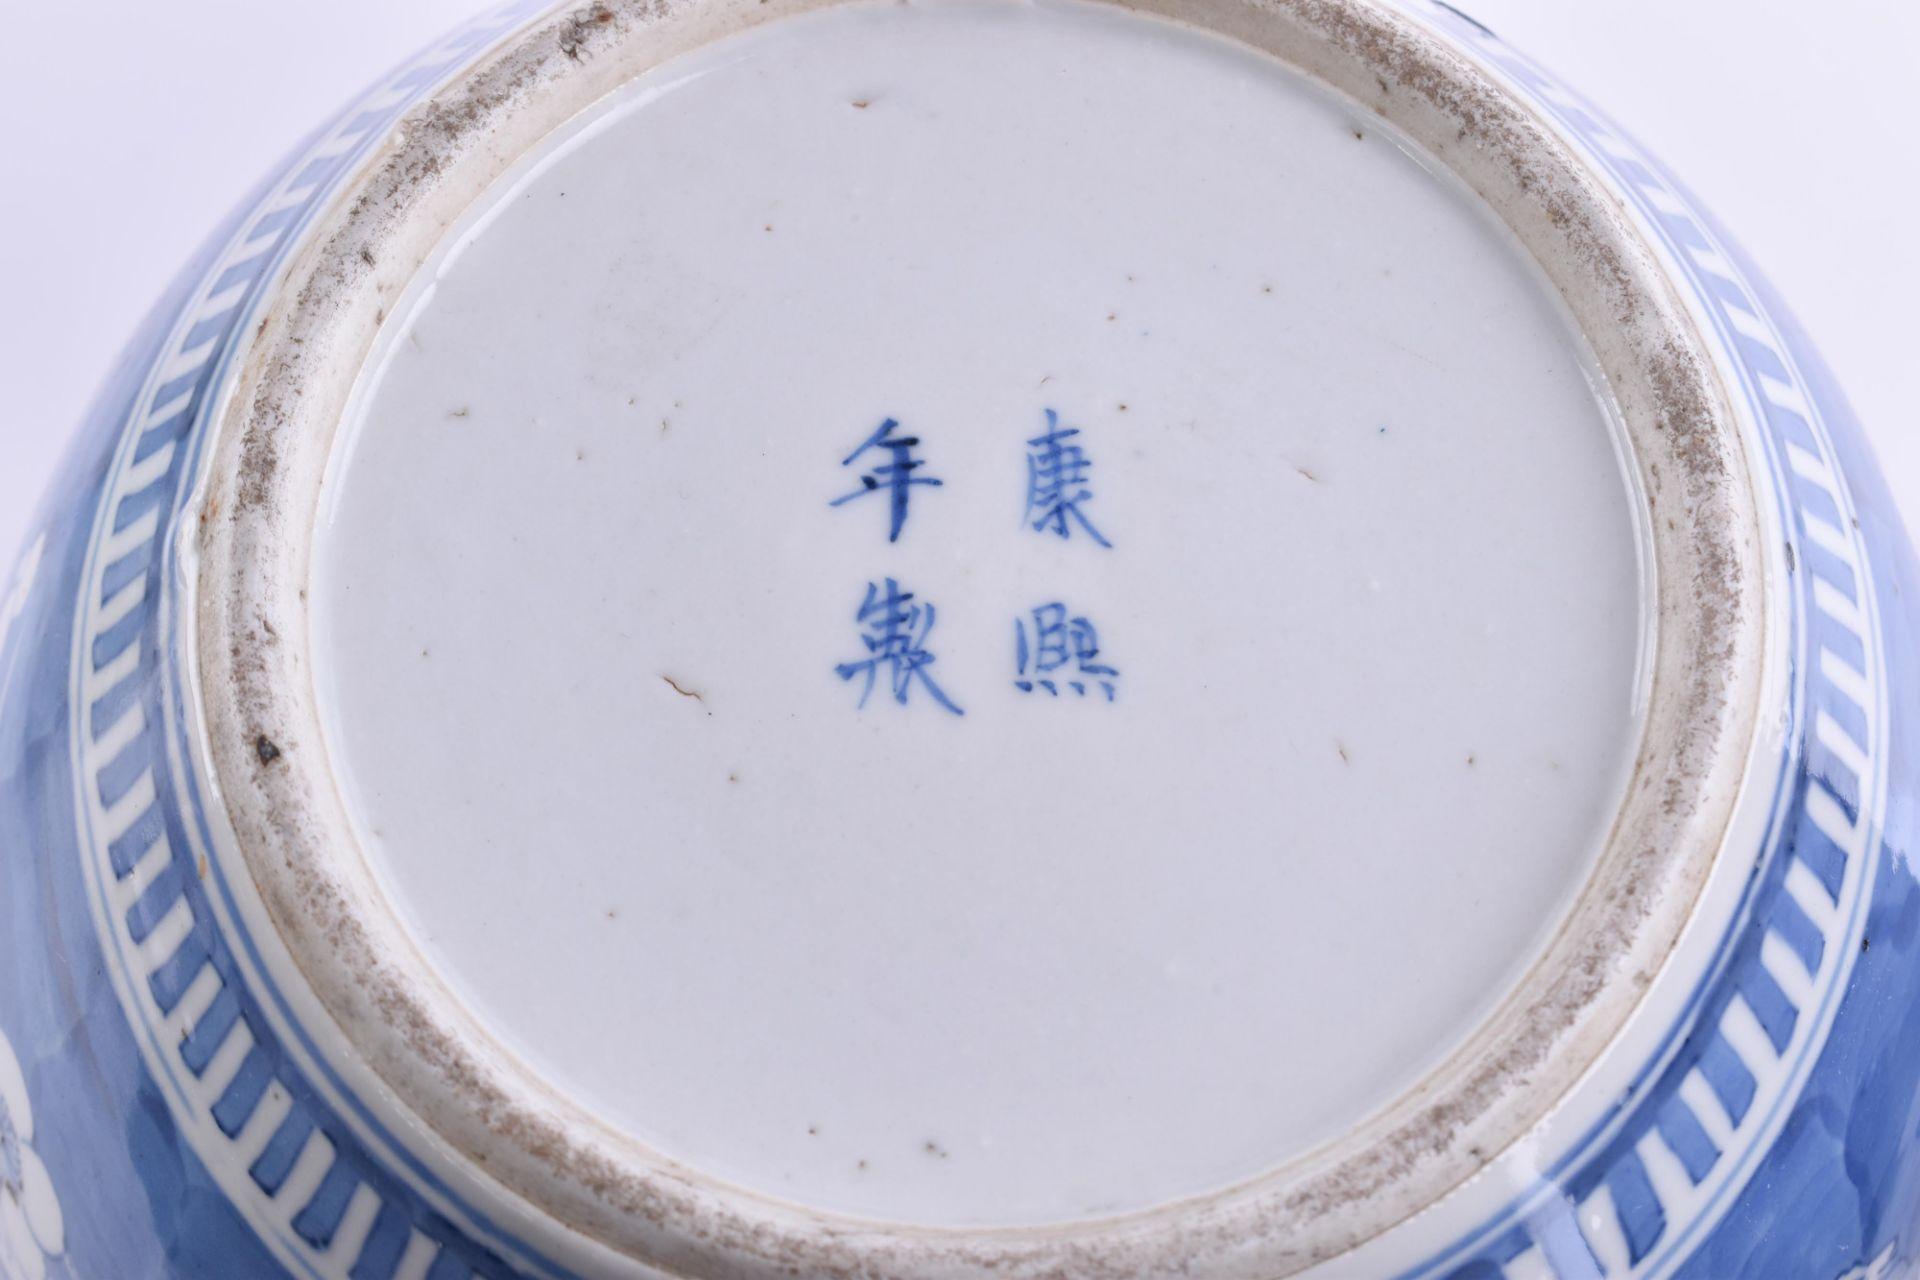 Ginger pot China Qing period - Image 4 of 4